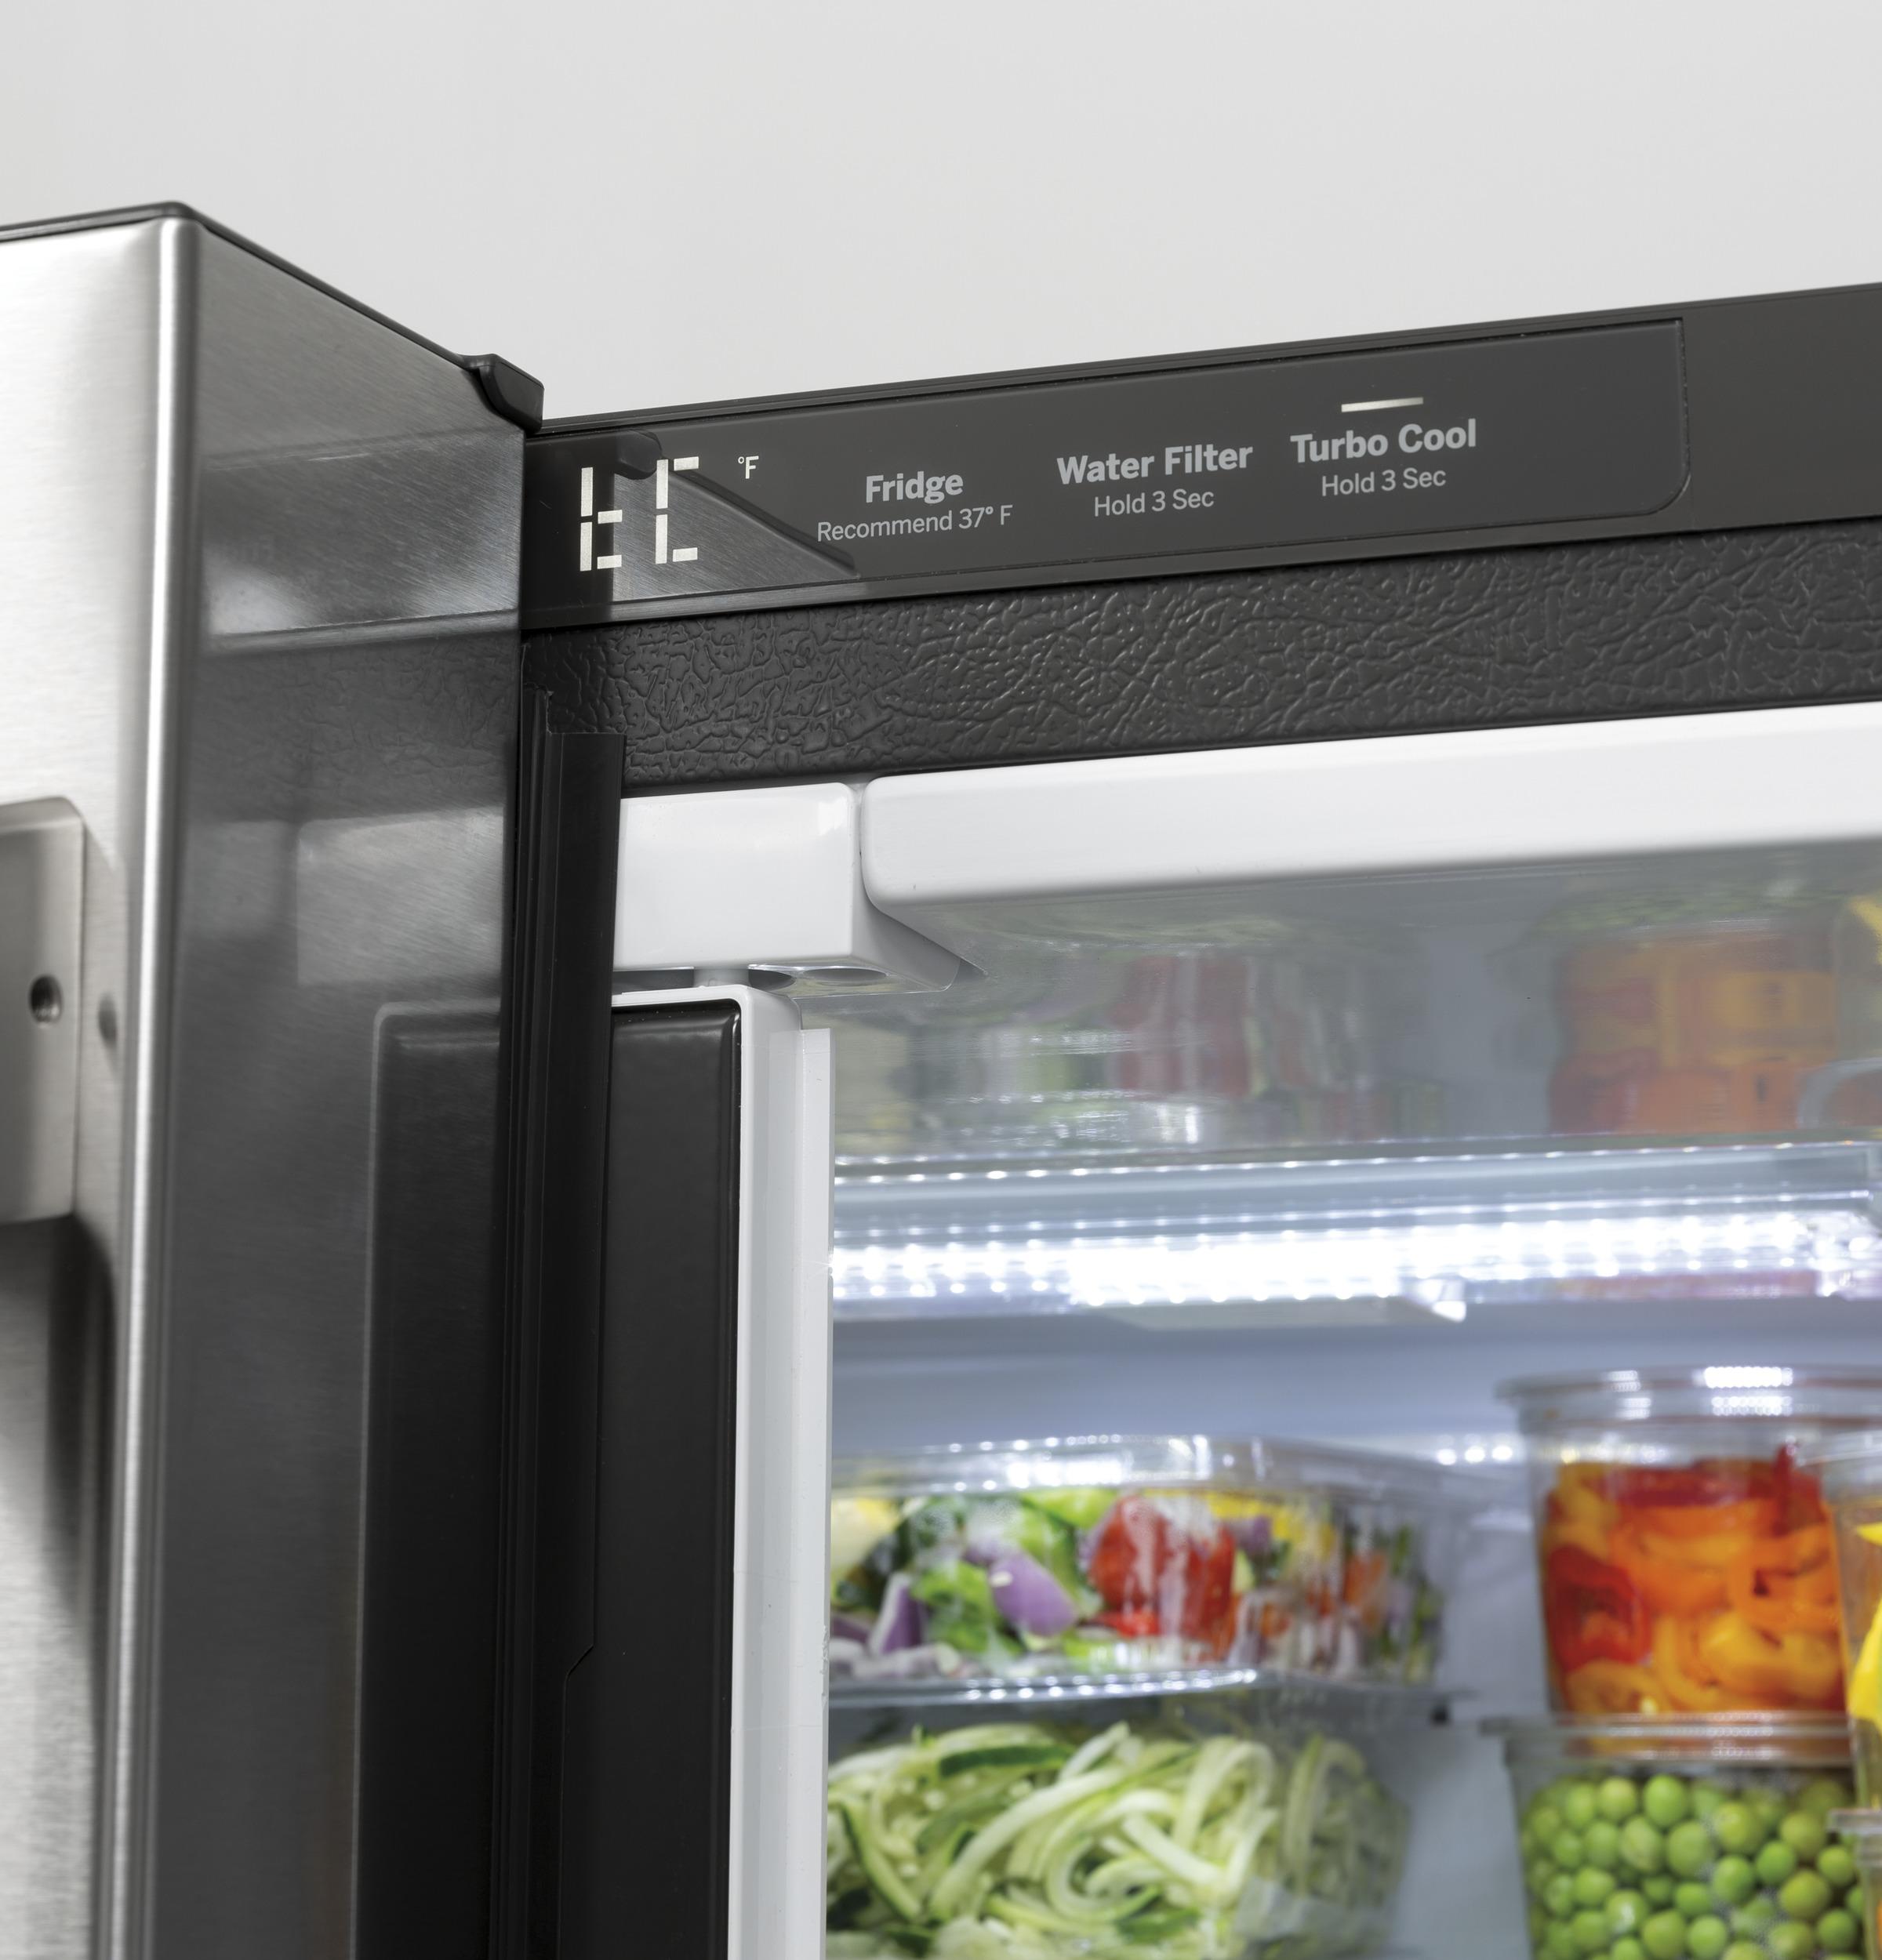 Model: CWE19SP4NW2 | Cafe Café™ ENERGY STAR® 18.6 Cu. Ft. Counter-Depth French-Door Refrigerator